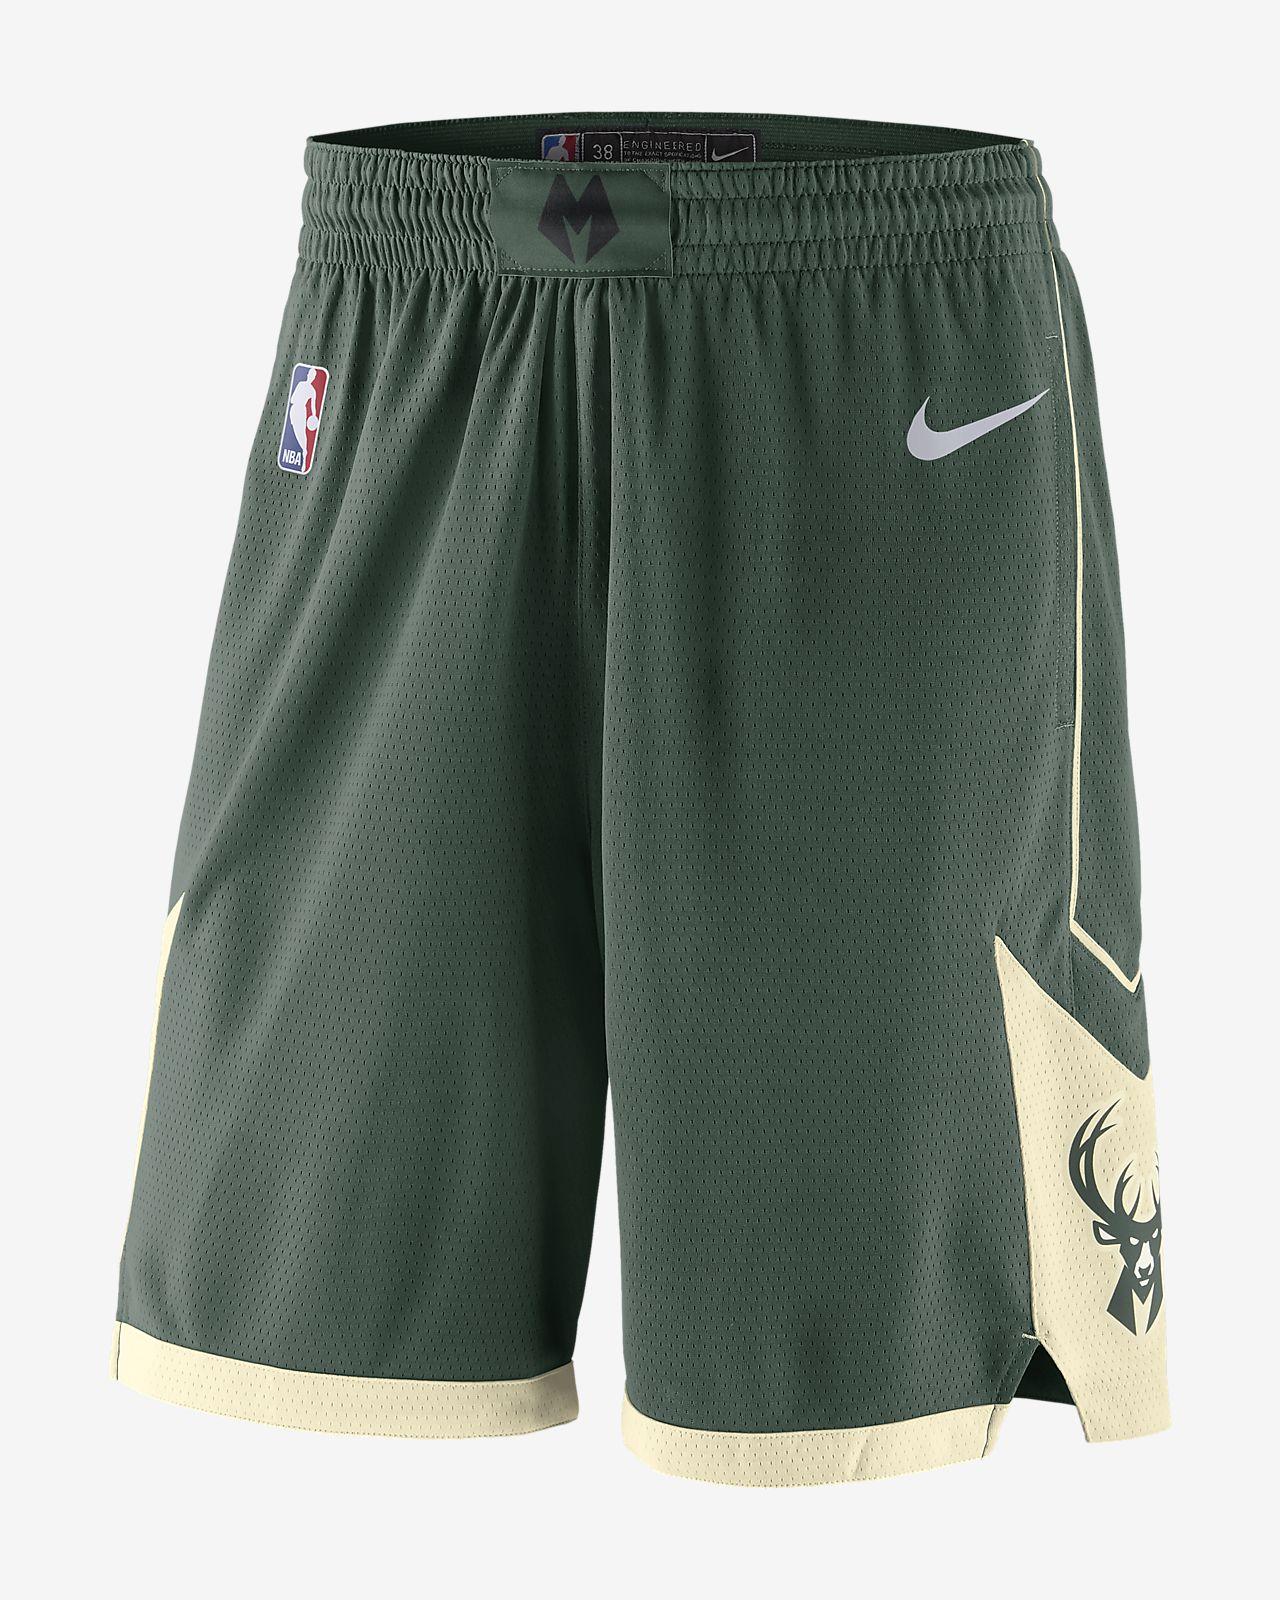 Milwaukee Bucks Icon Edition Swingman Men's Nike NBA Shorts